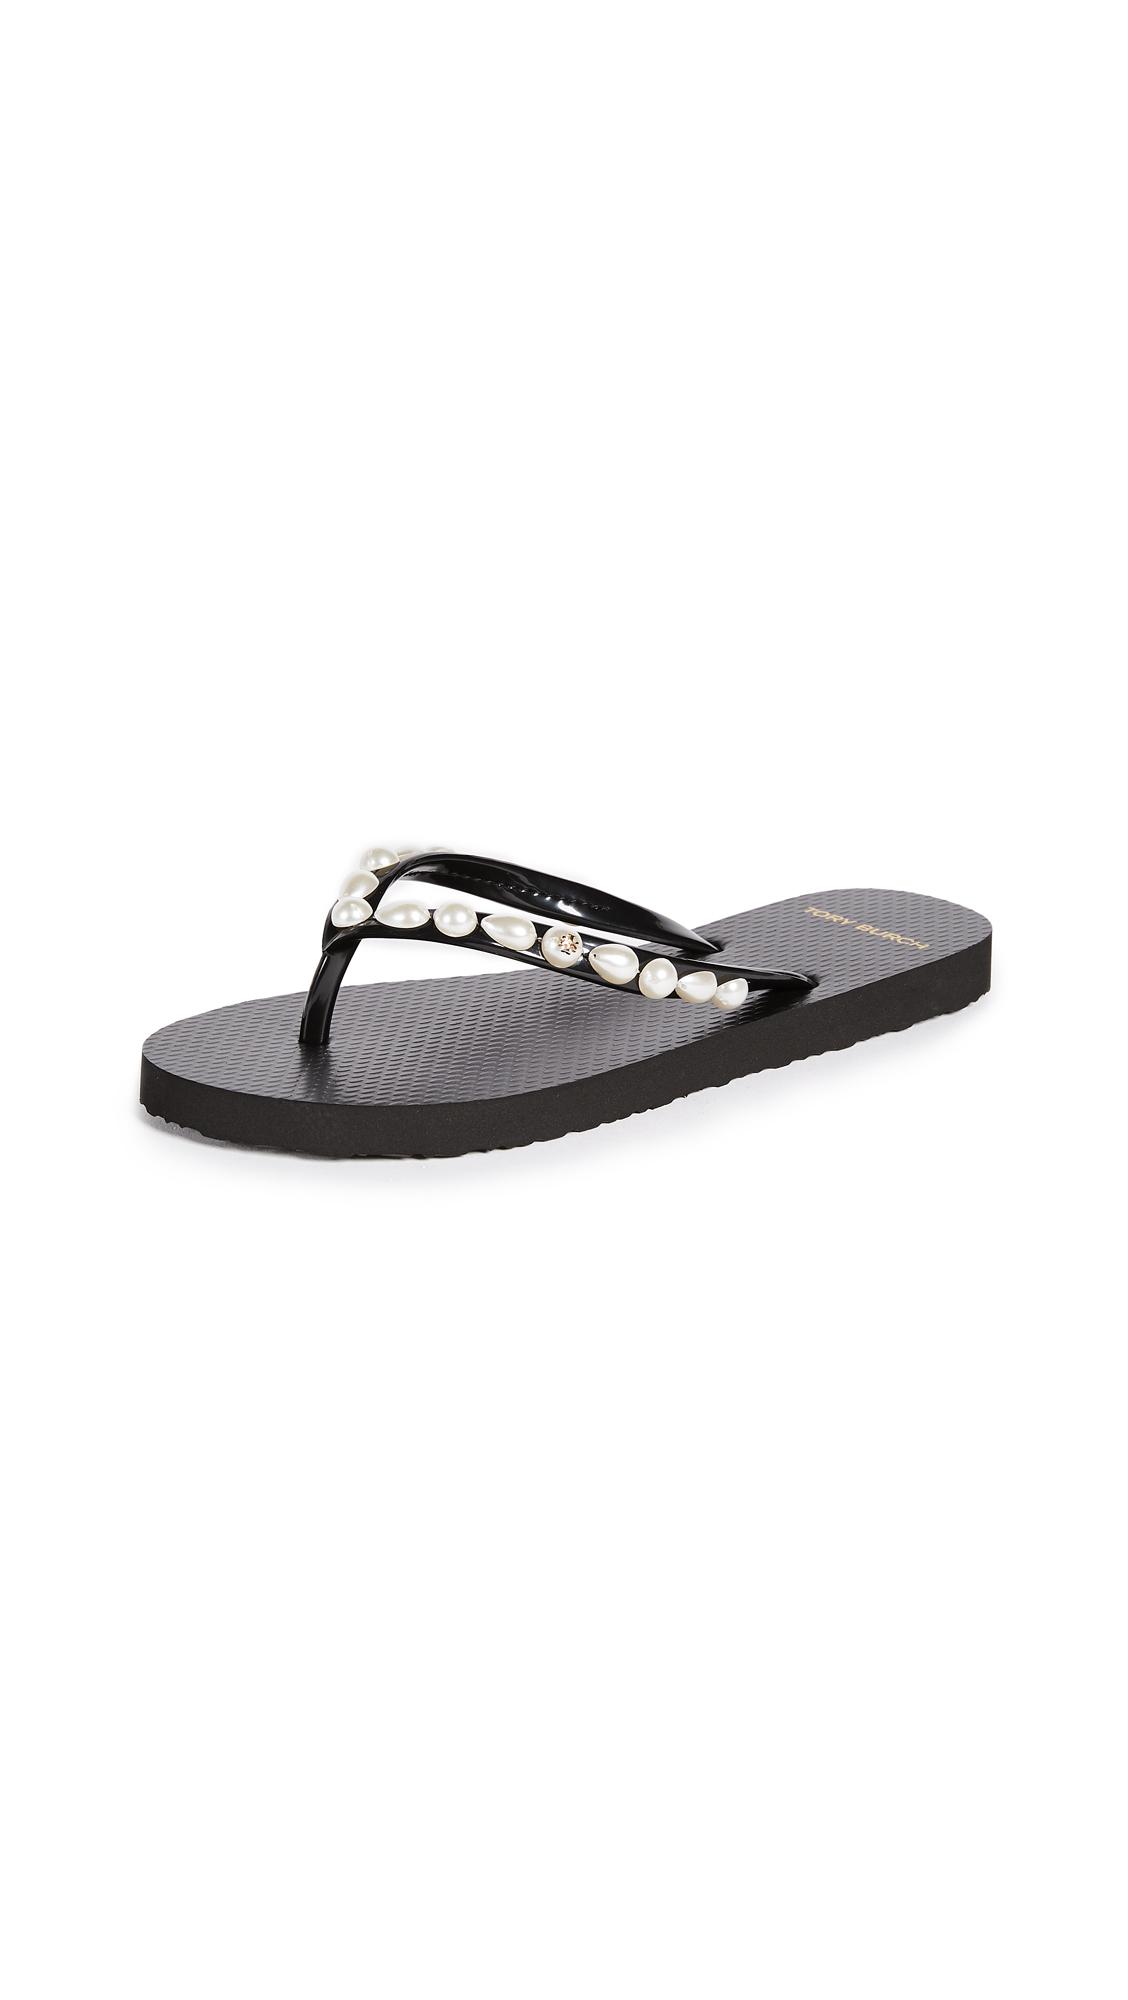 Tory Burch Jeweled Thin Flip Flops - Black